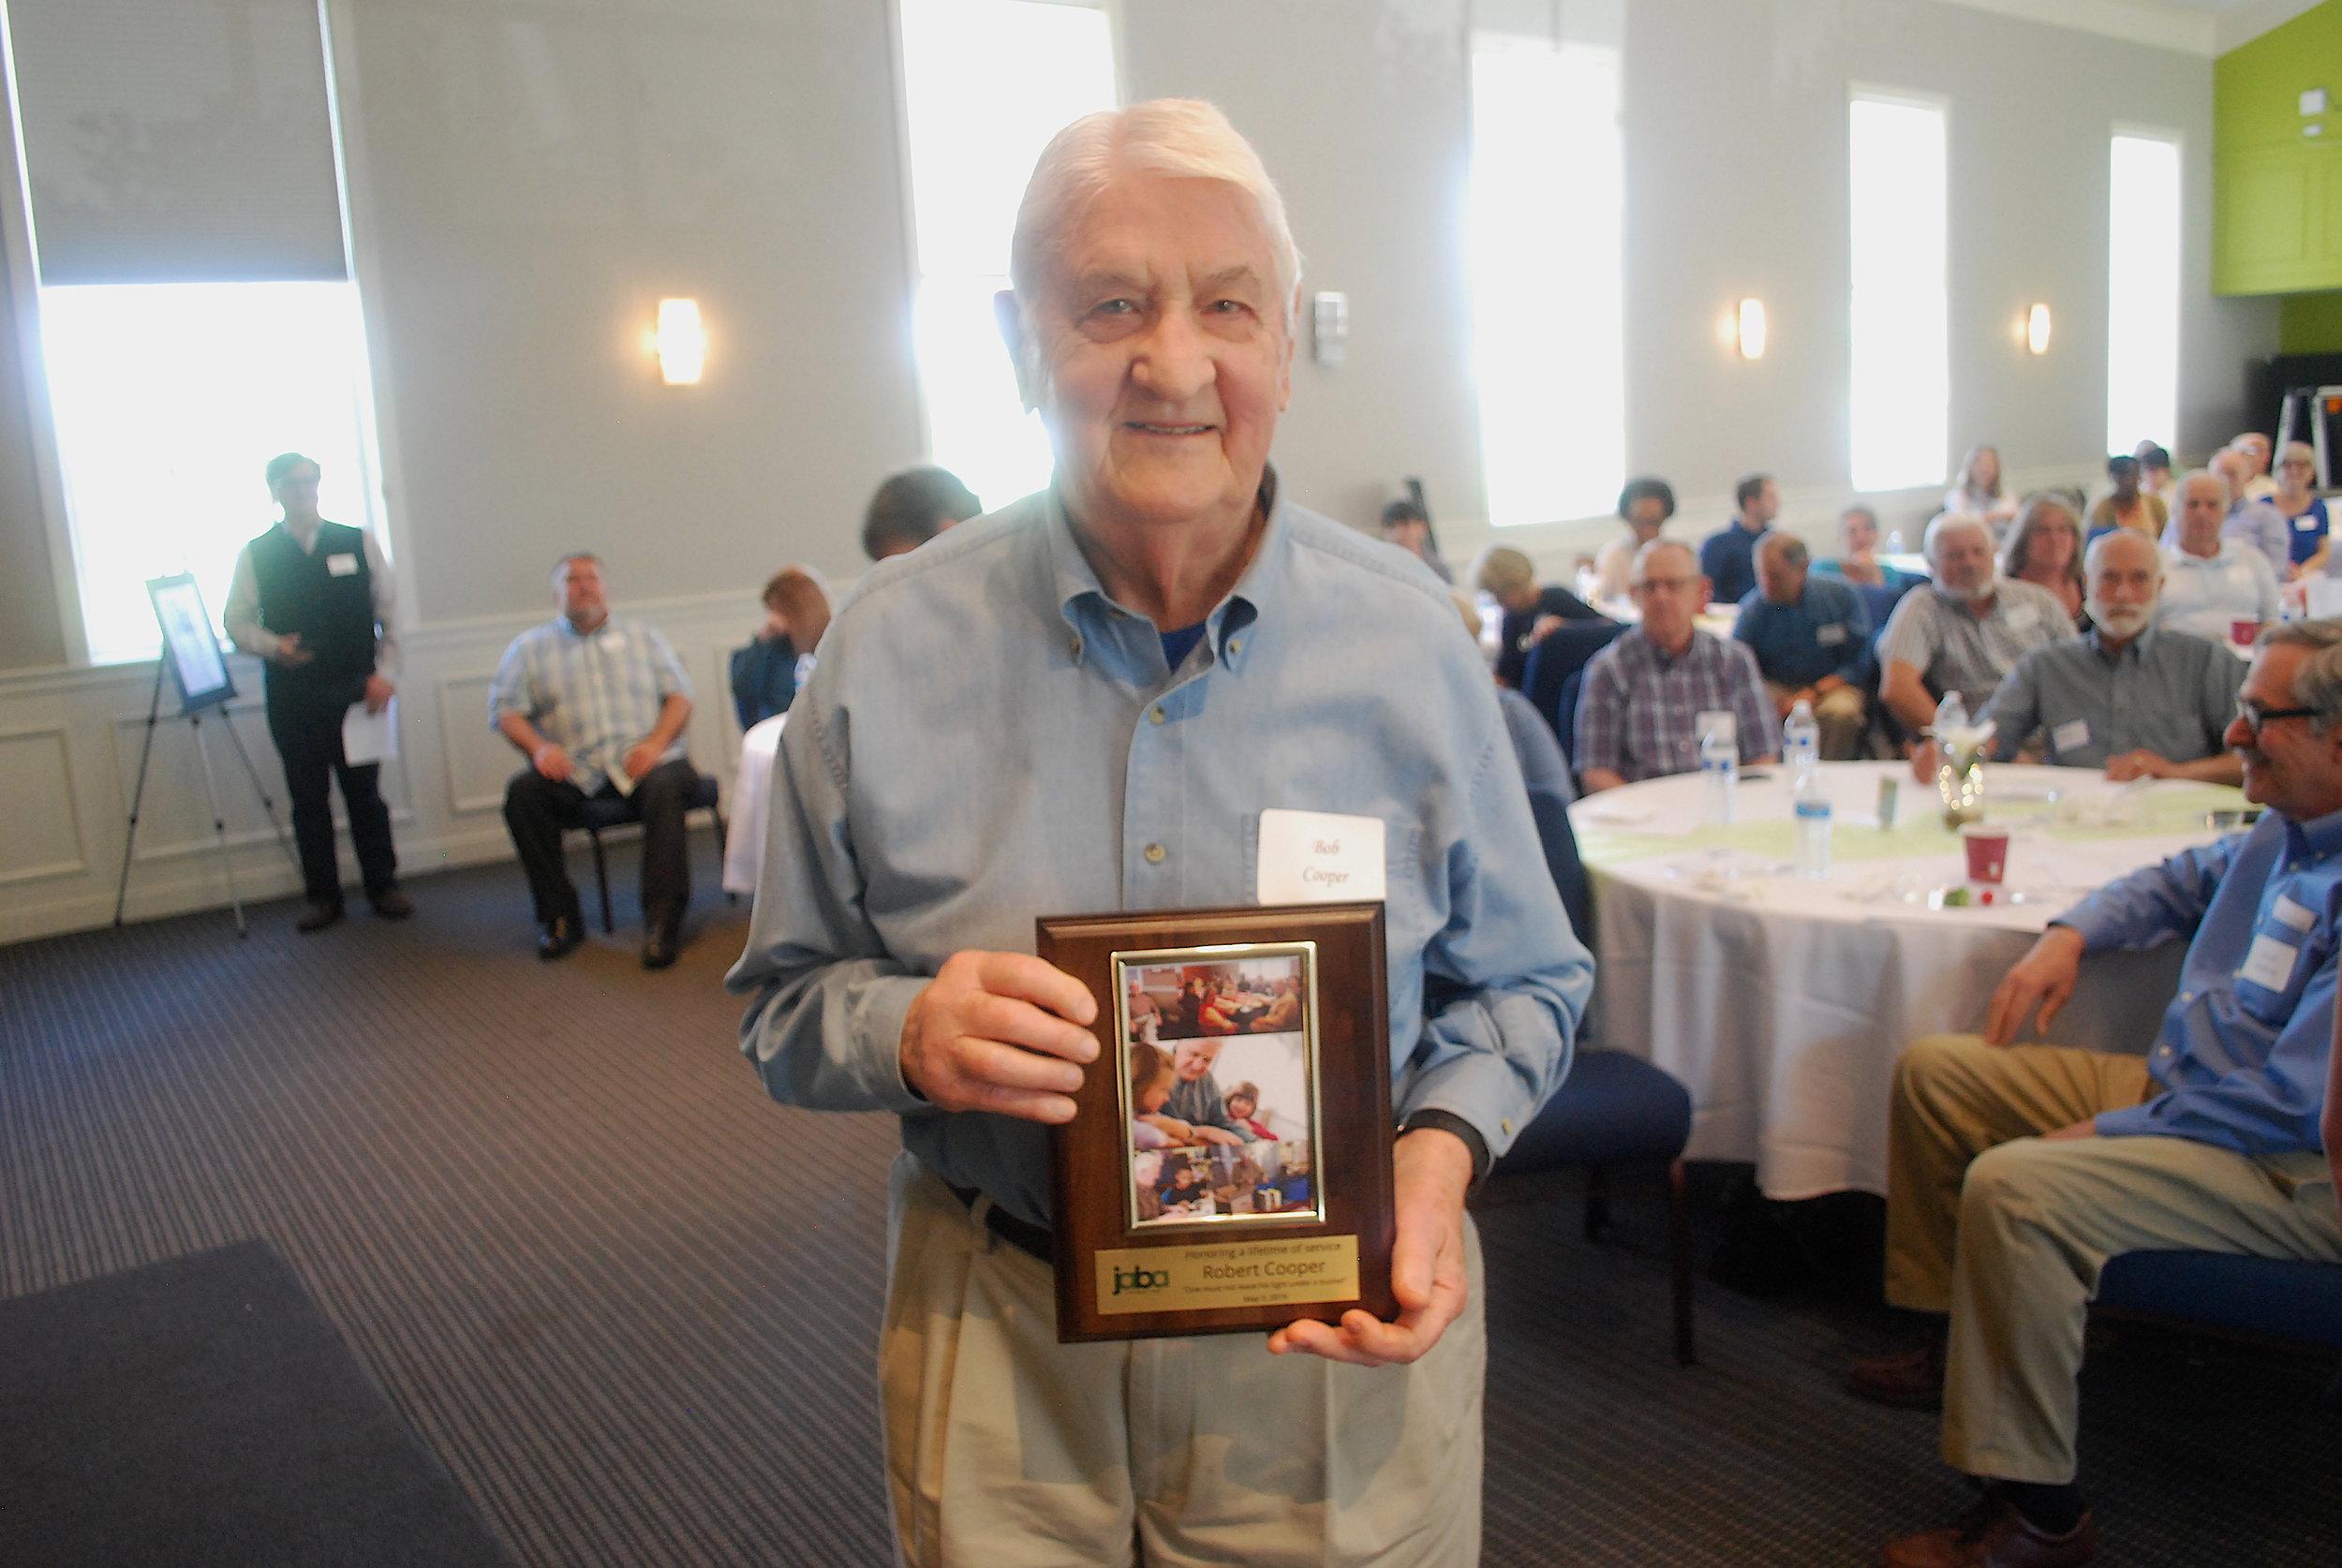 Long-time JABA volunteer Bob Cooper